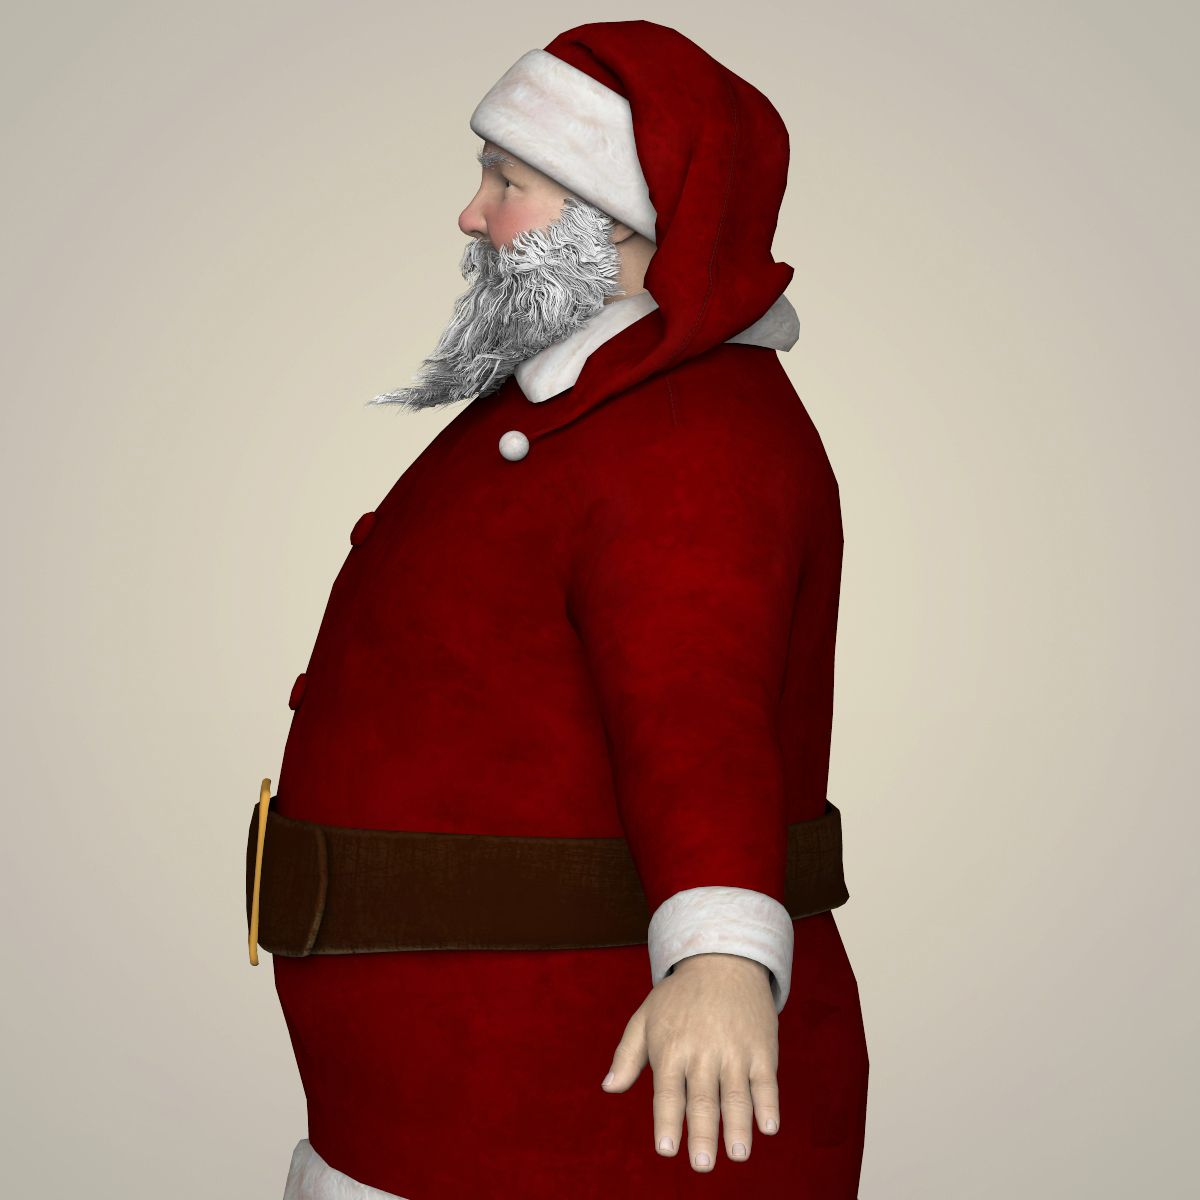 Santa Claus Santa Claus Santa Clause